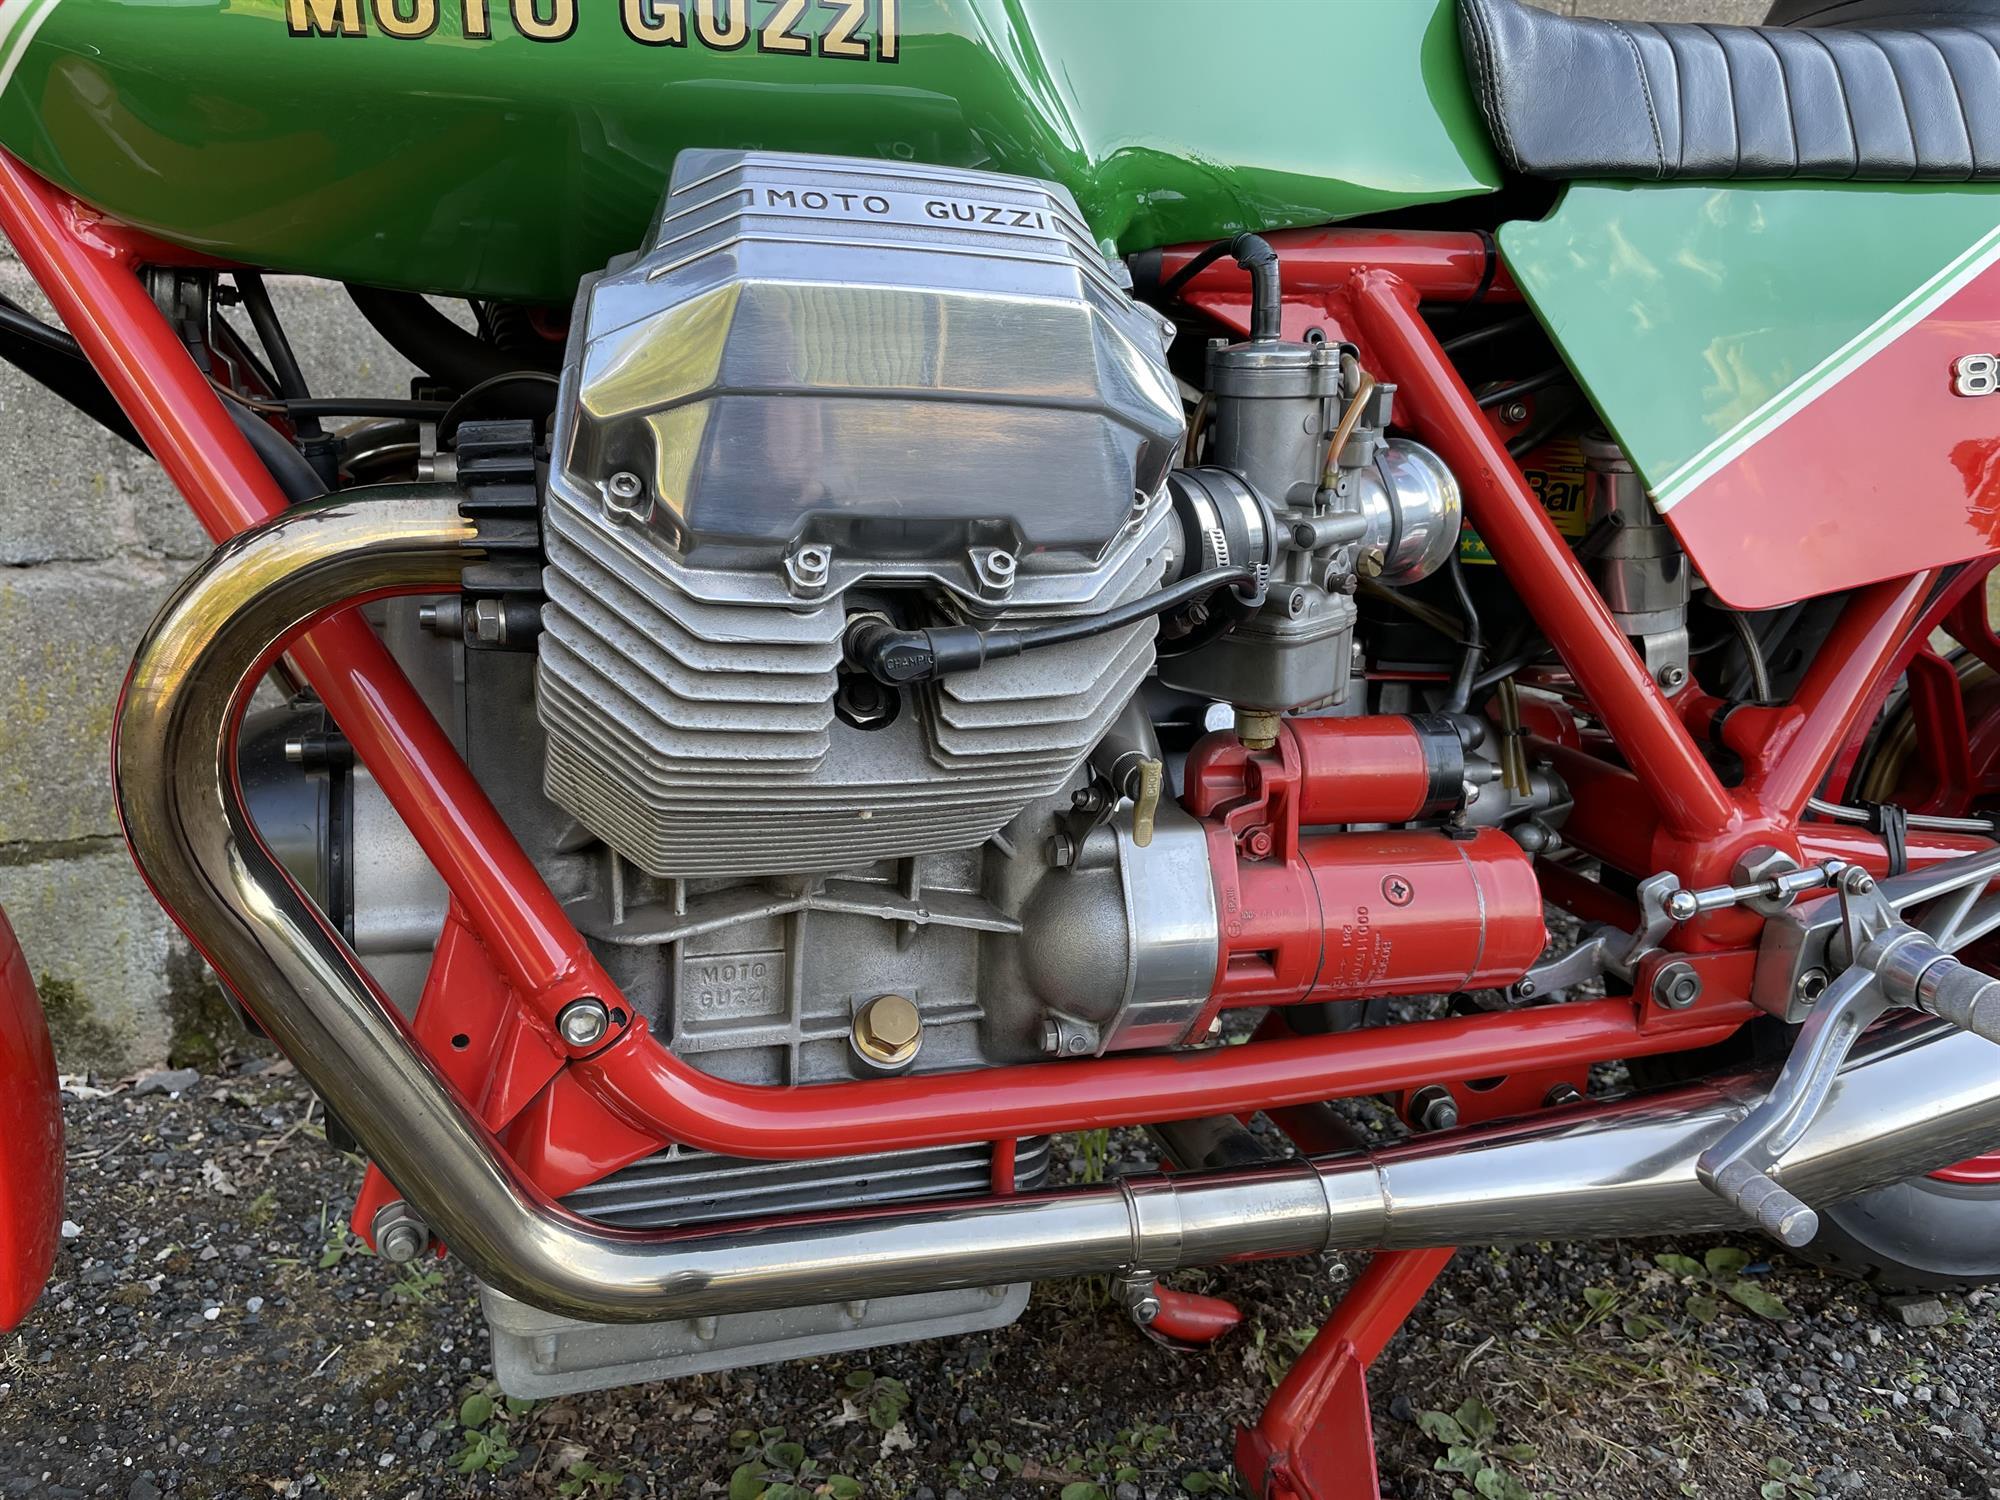 1983 Moto Guzzi 850 Le Mans III - Image 7 of 10